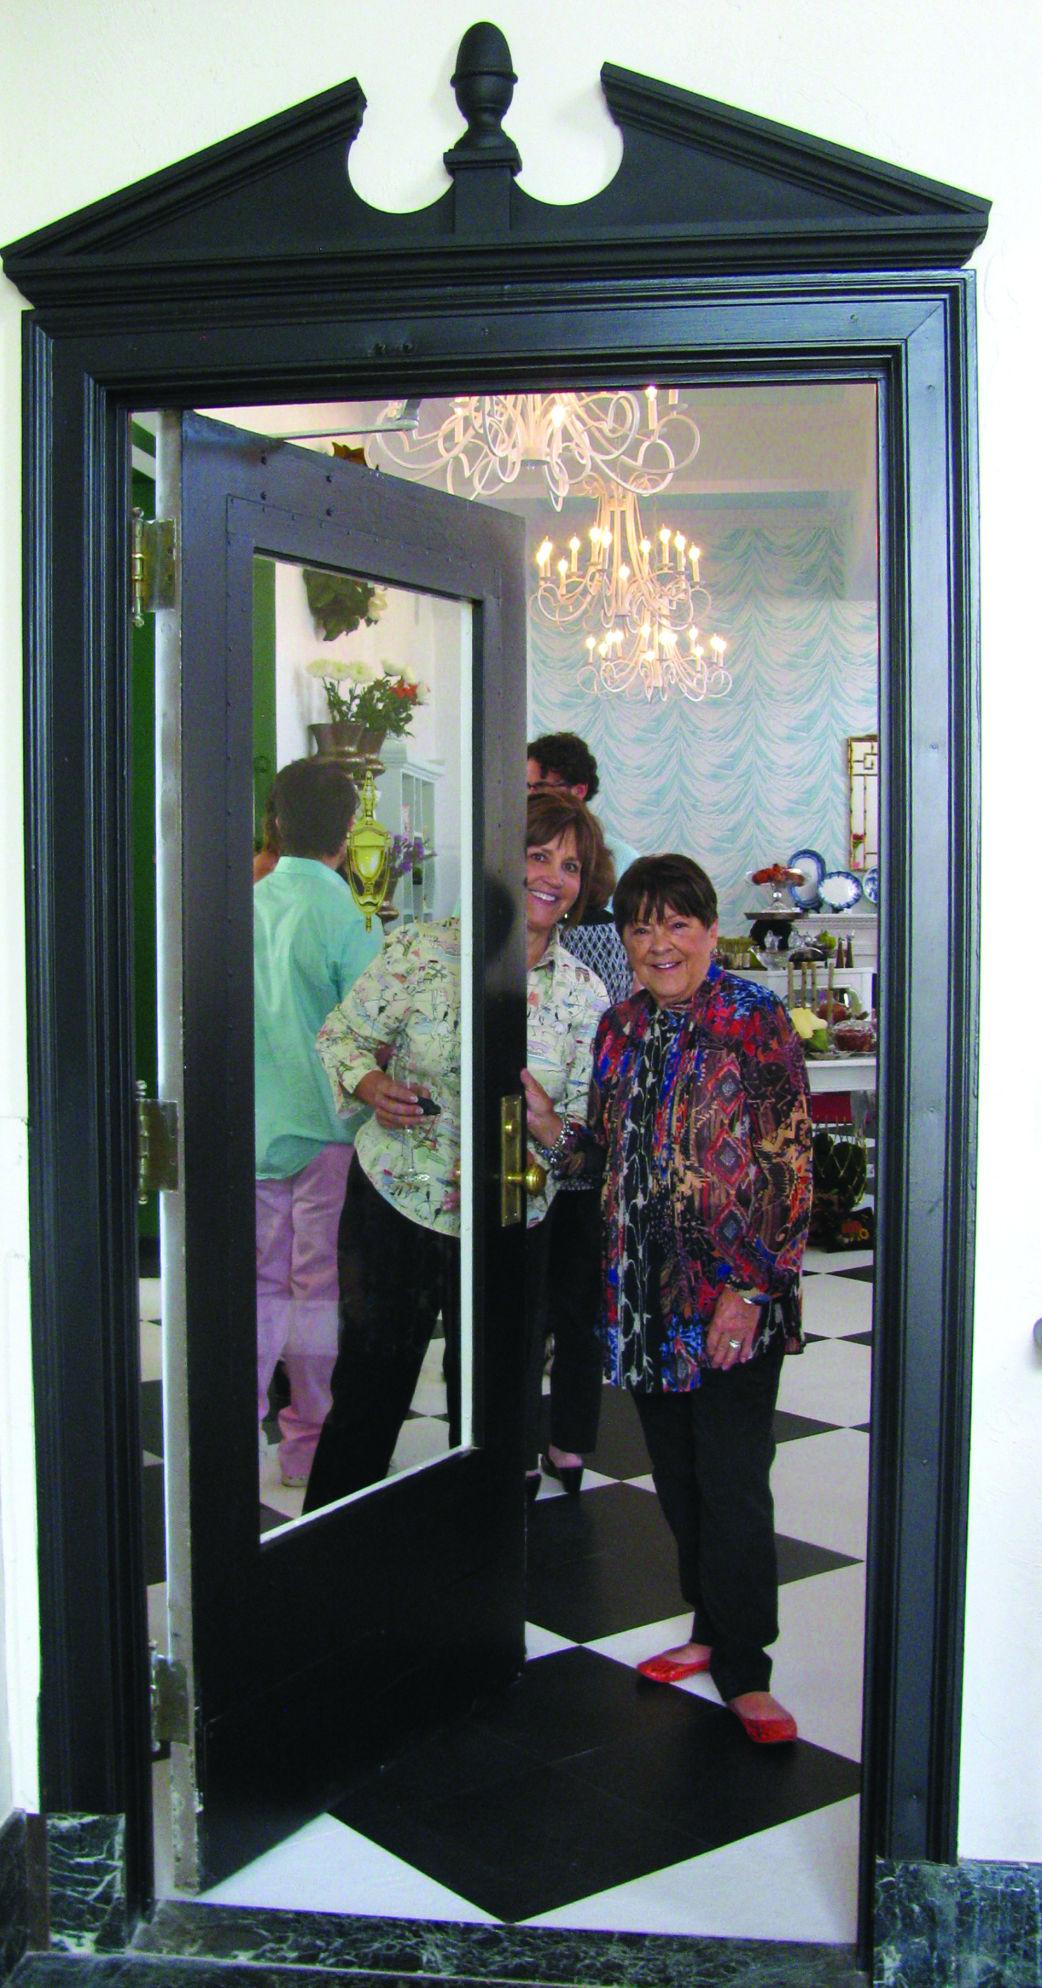 Garden Party Flower Shop opens on Main Street in Downtown Stillwater News